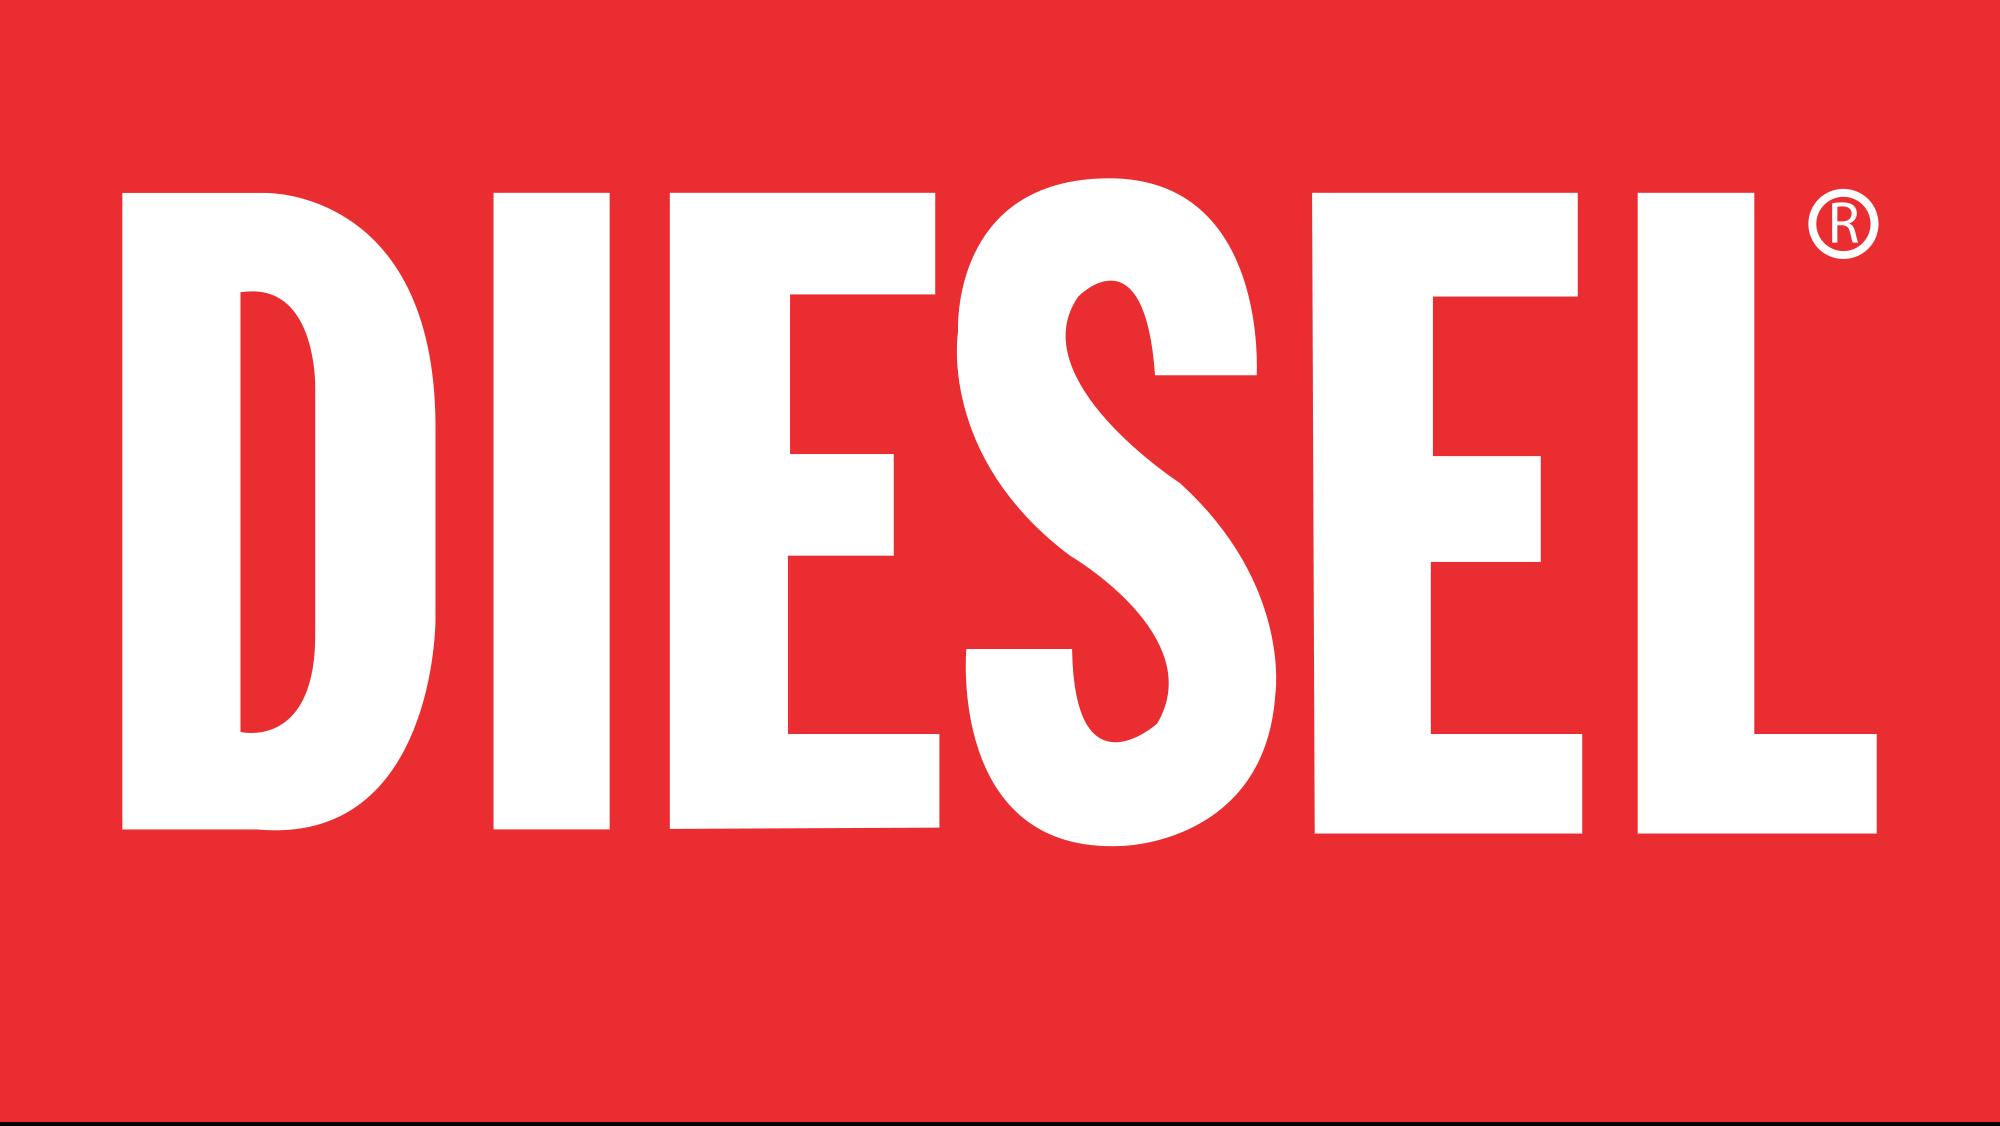 Diesel Logo Wallpaper